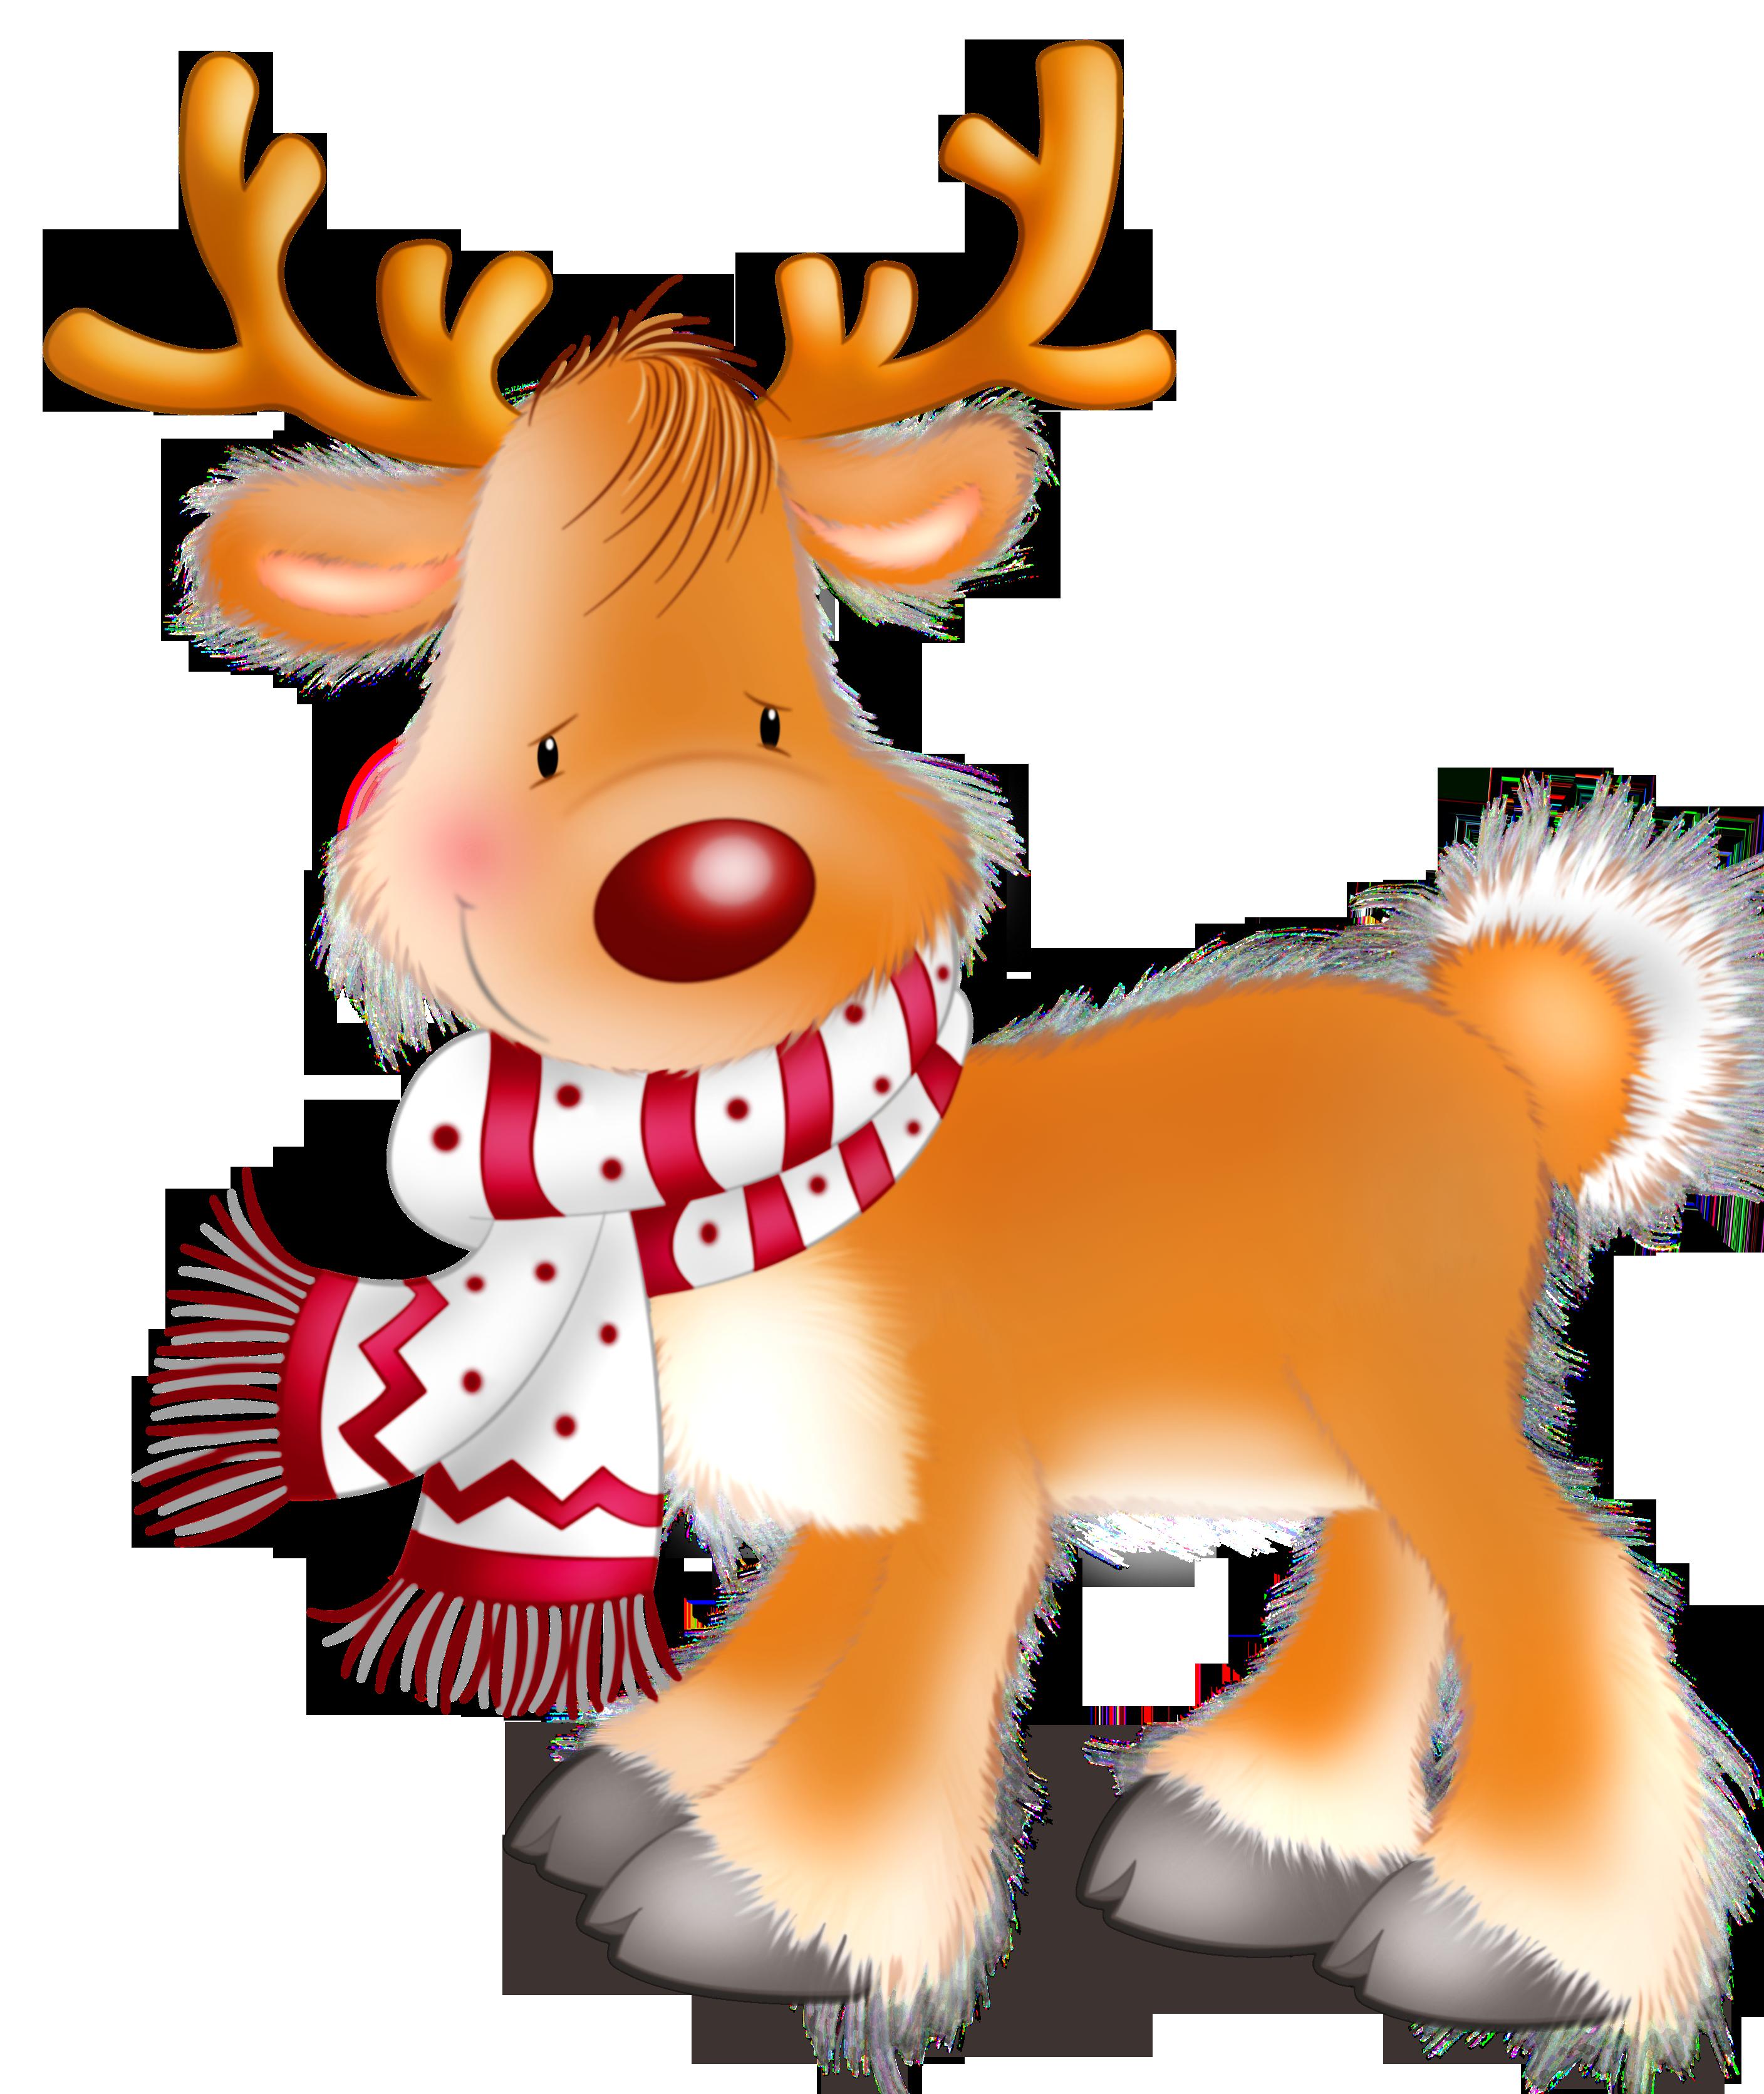 rudolph clip art cliparts co winter story time 2016 pinterest rh pinterest com rudolph antlers clip art rudolph antlers clip art